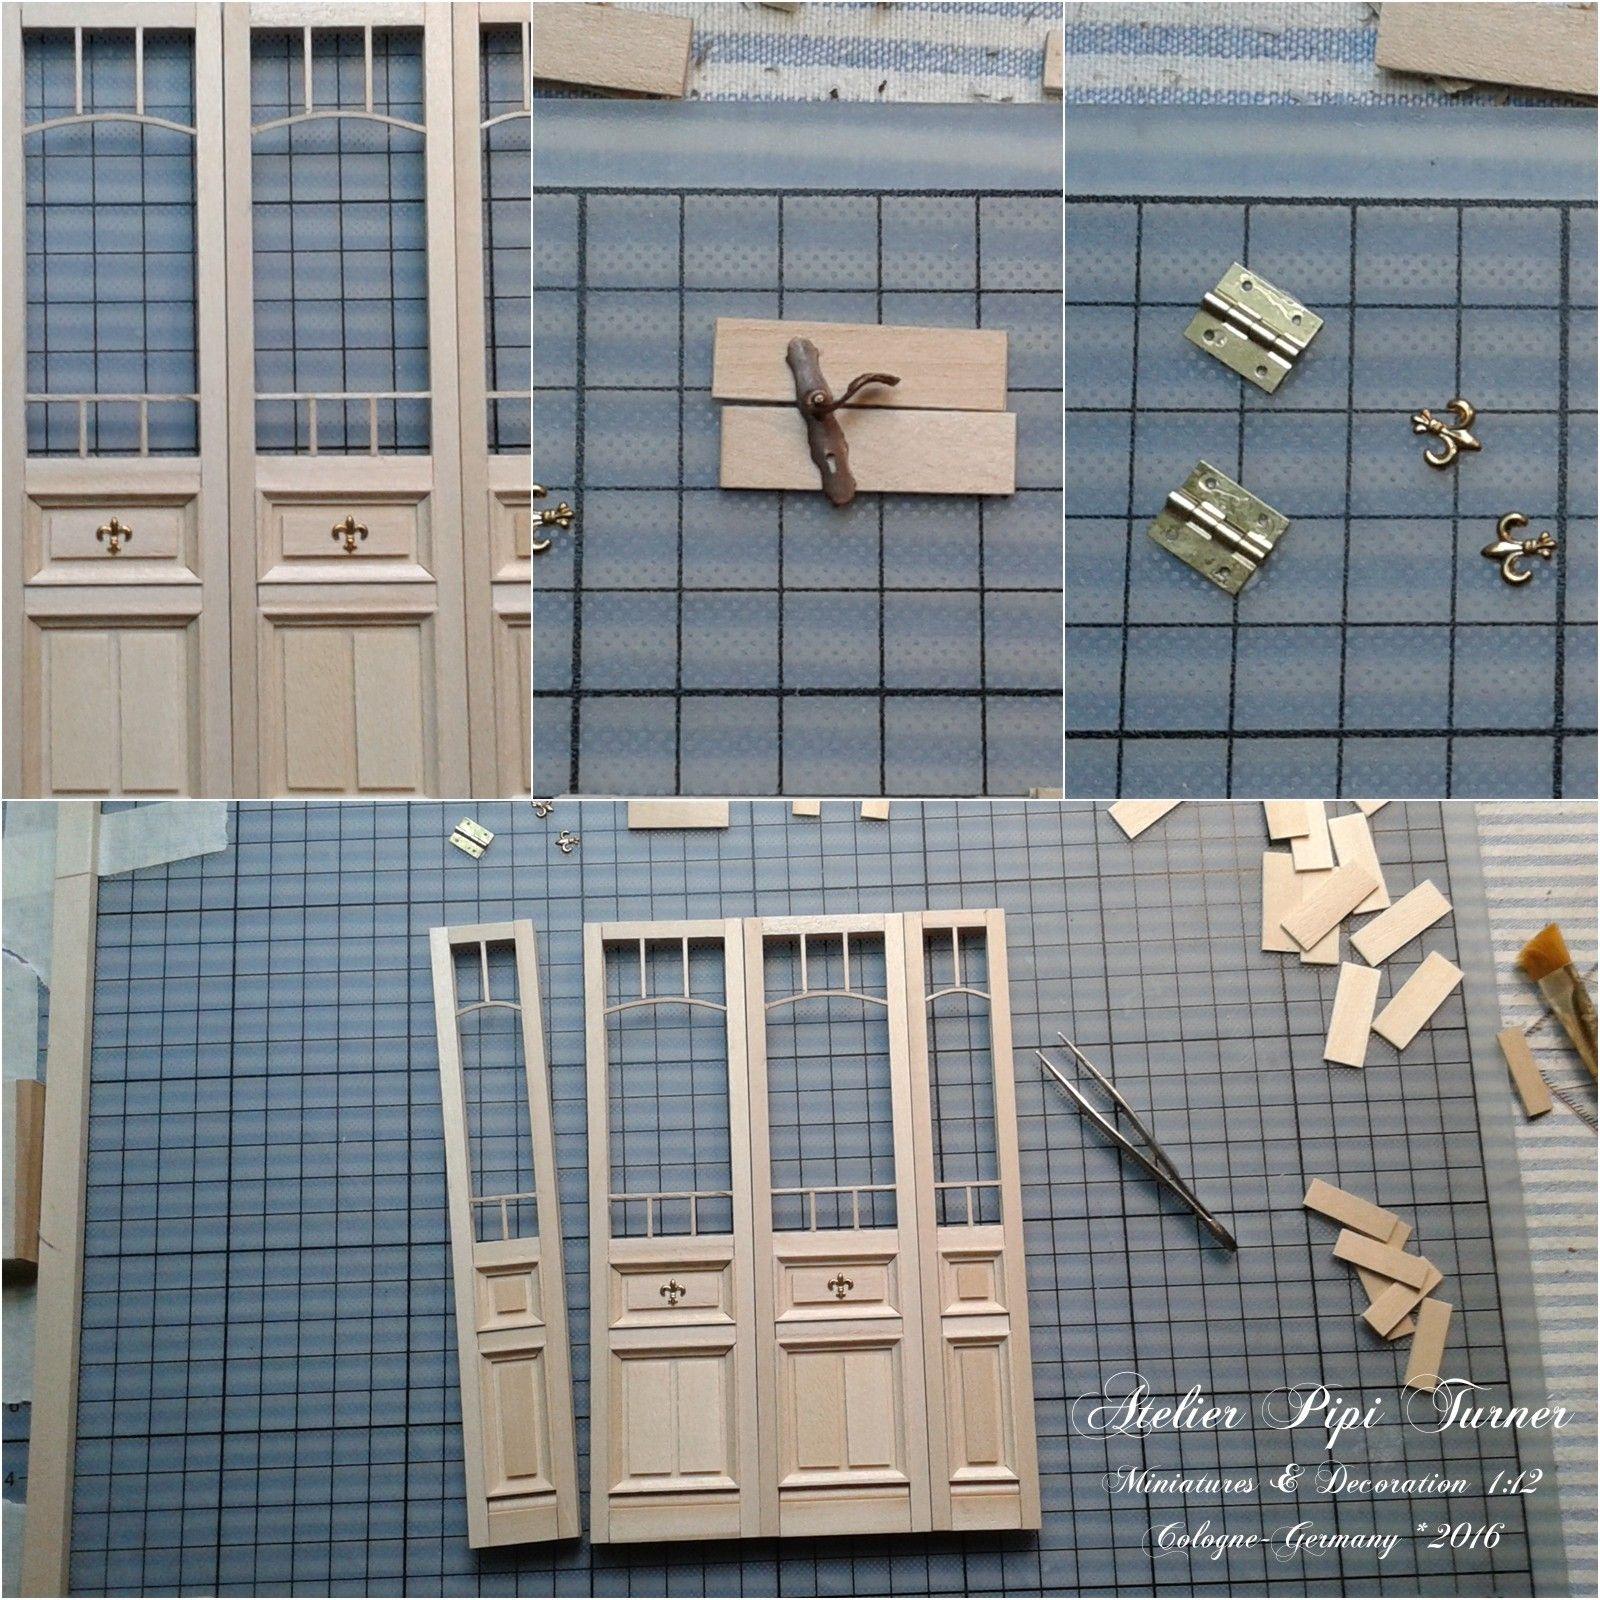 Dollhouse Miniatures Diy Tutorials: Pipi Turner Miniatures ♥: Working Door